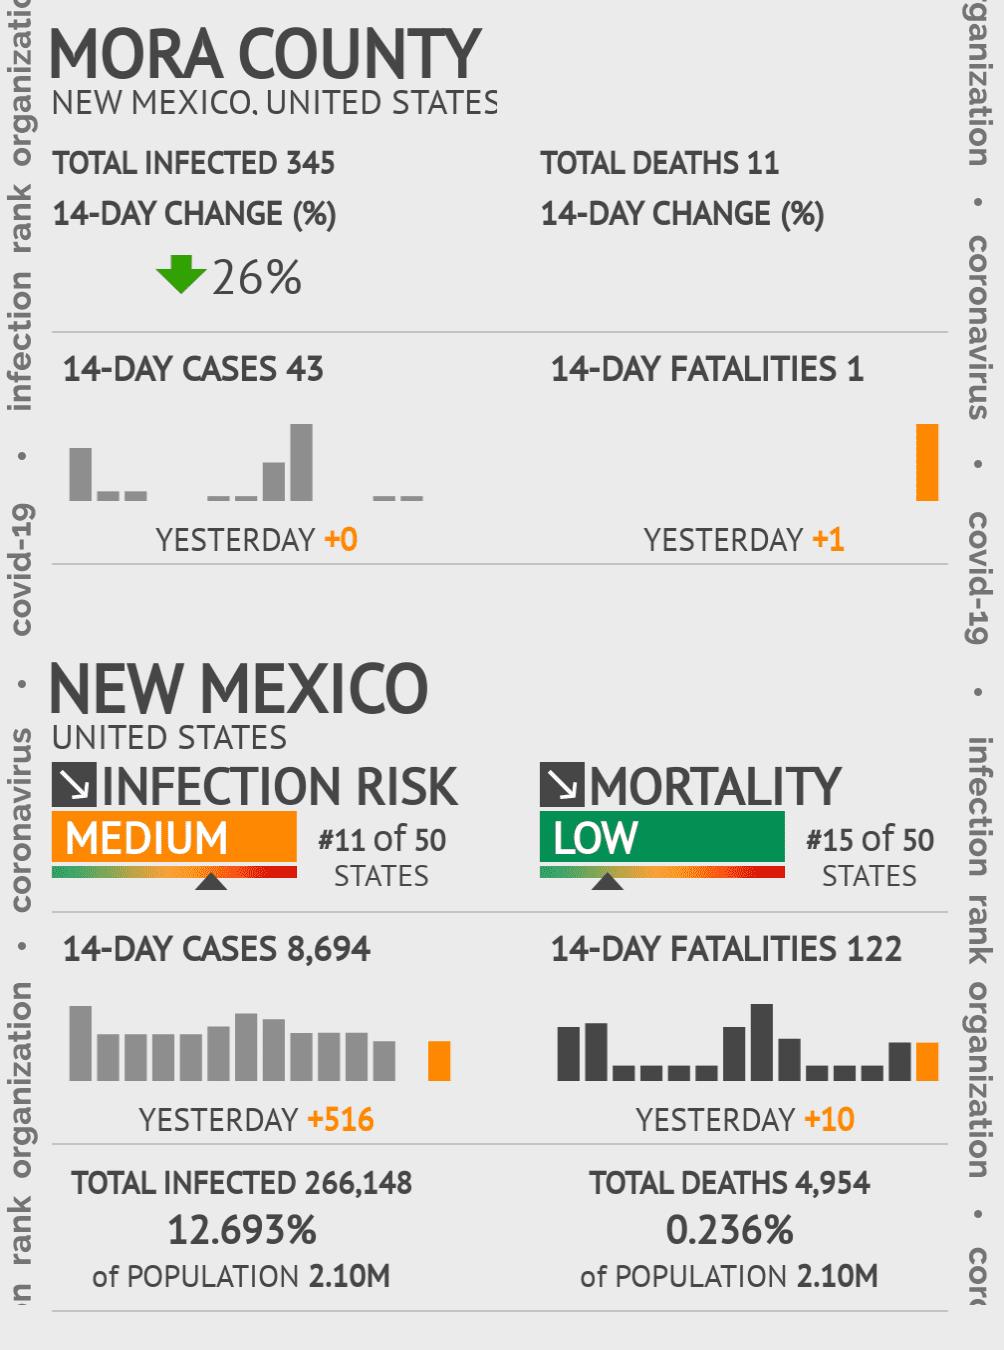 Mora County Coronavirus Covid-19 Risk of Infection on July 24, 2021